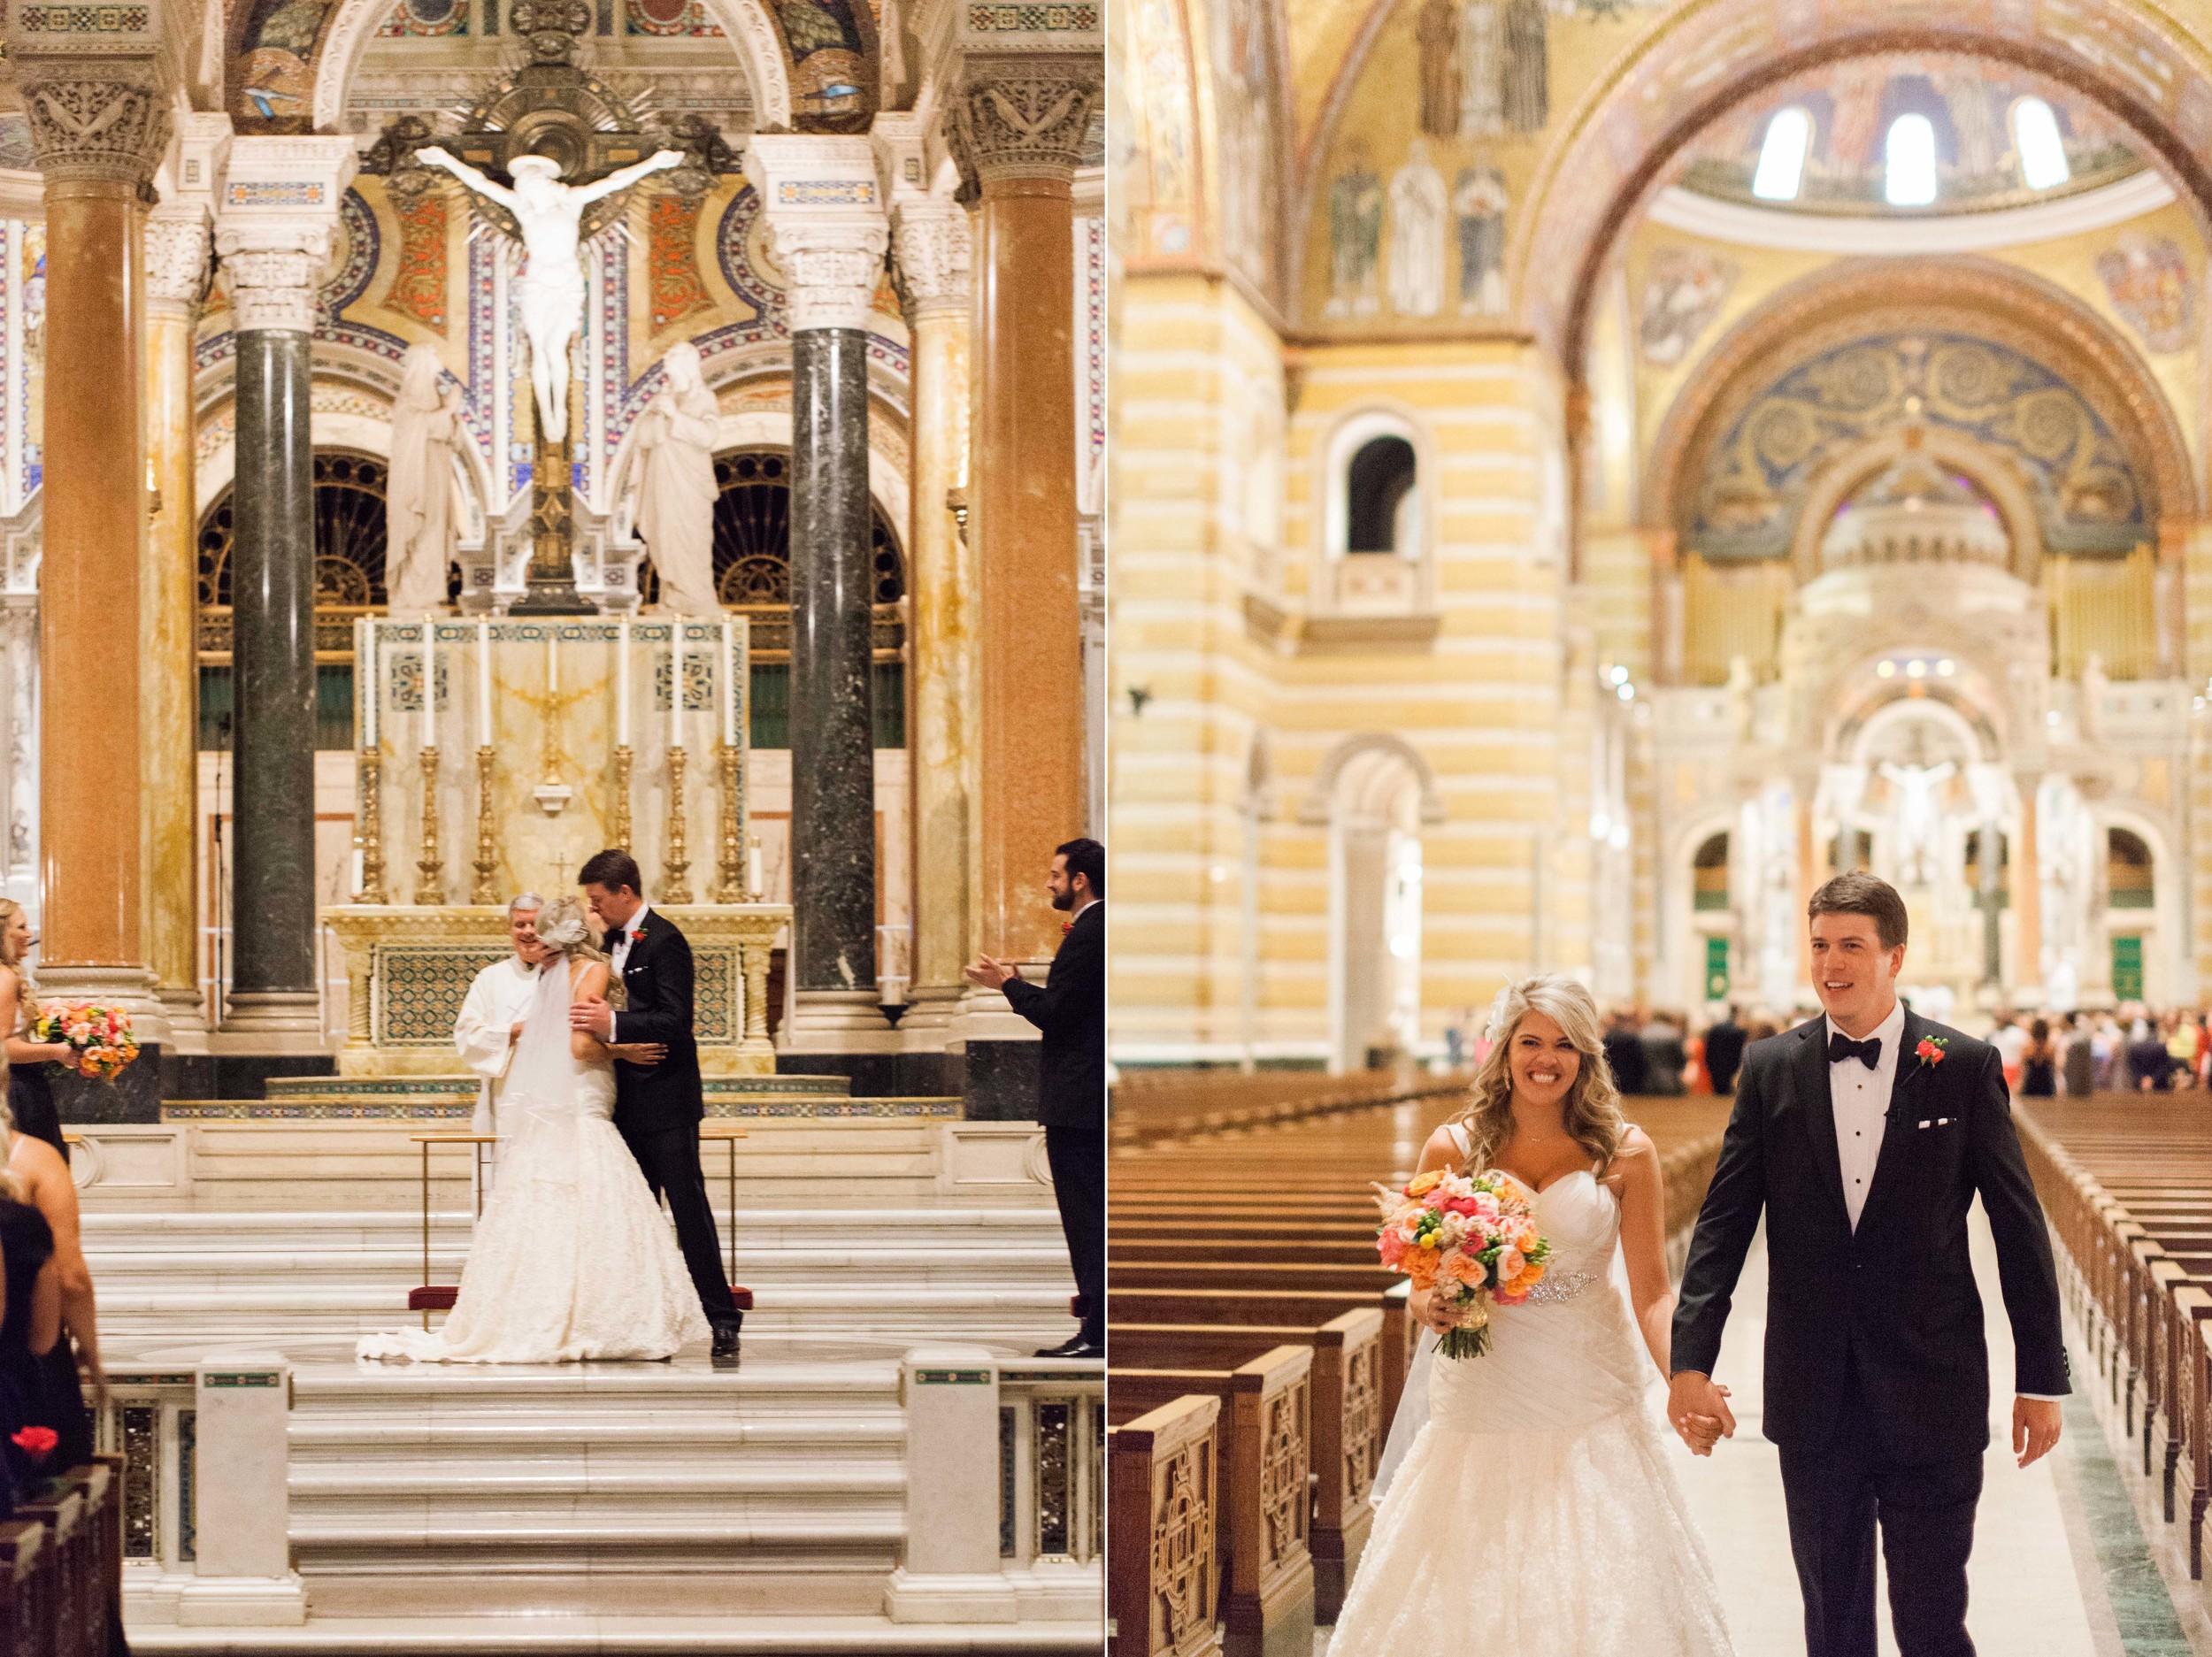 Chase Park Plaza St Louis Wedding Photo-1039 copy.jpg